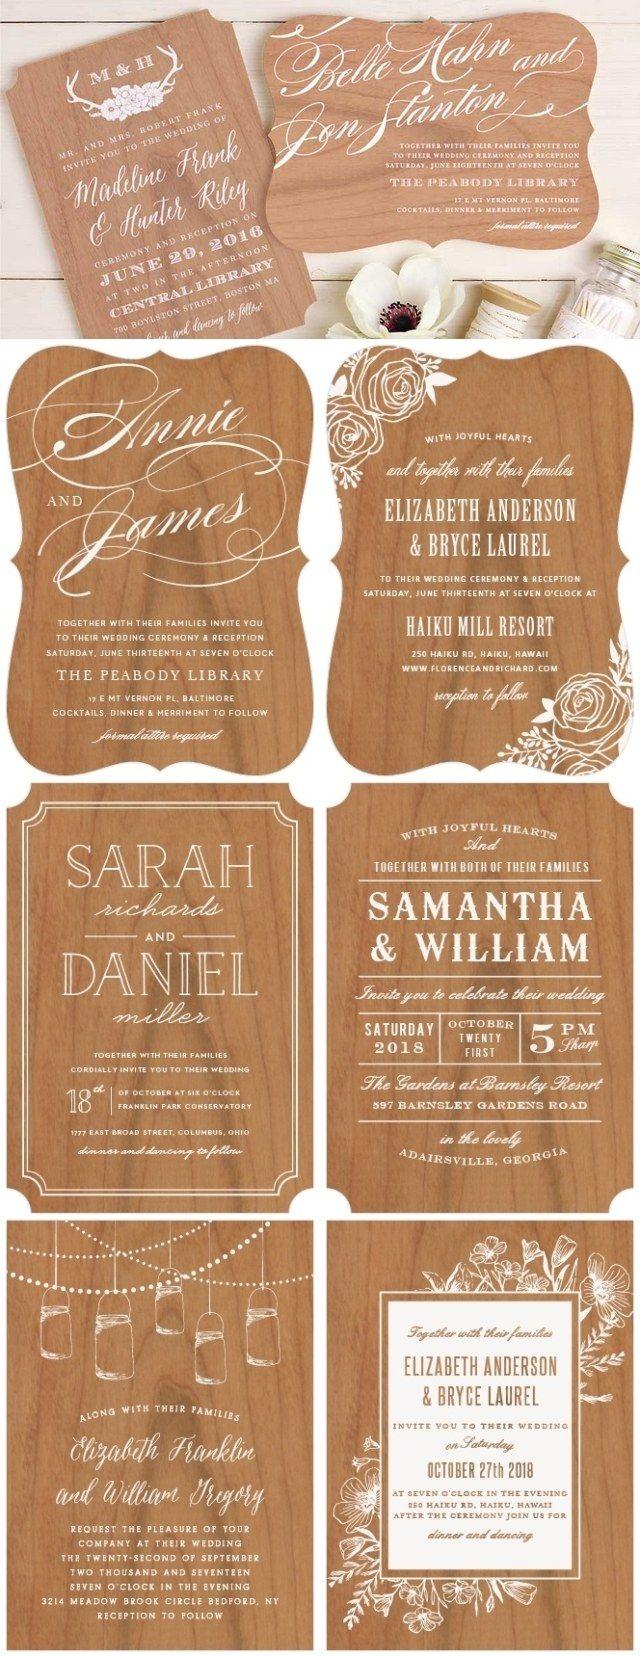 basic invite rustic real wood wedding invitations / http://www.deerpearlflowers.com/how-to-create-wedding-invitations-online/